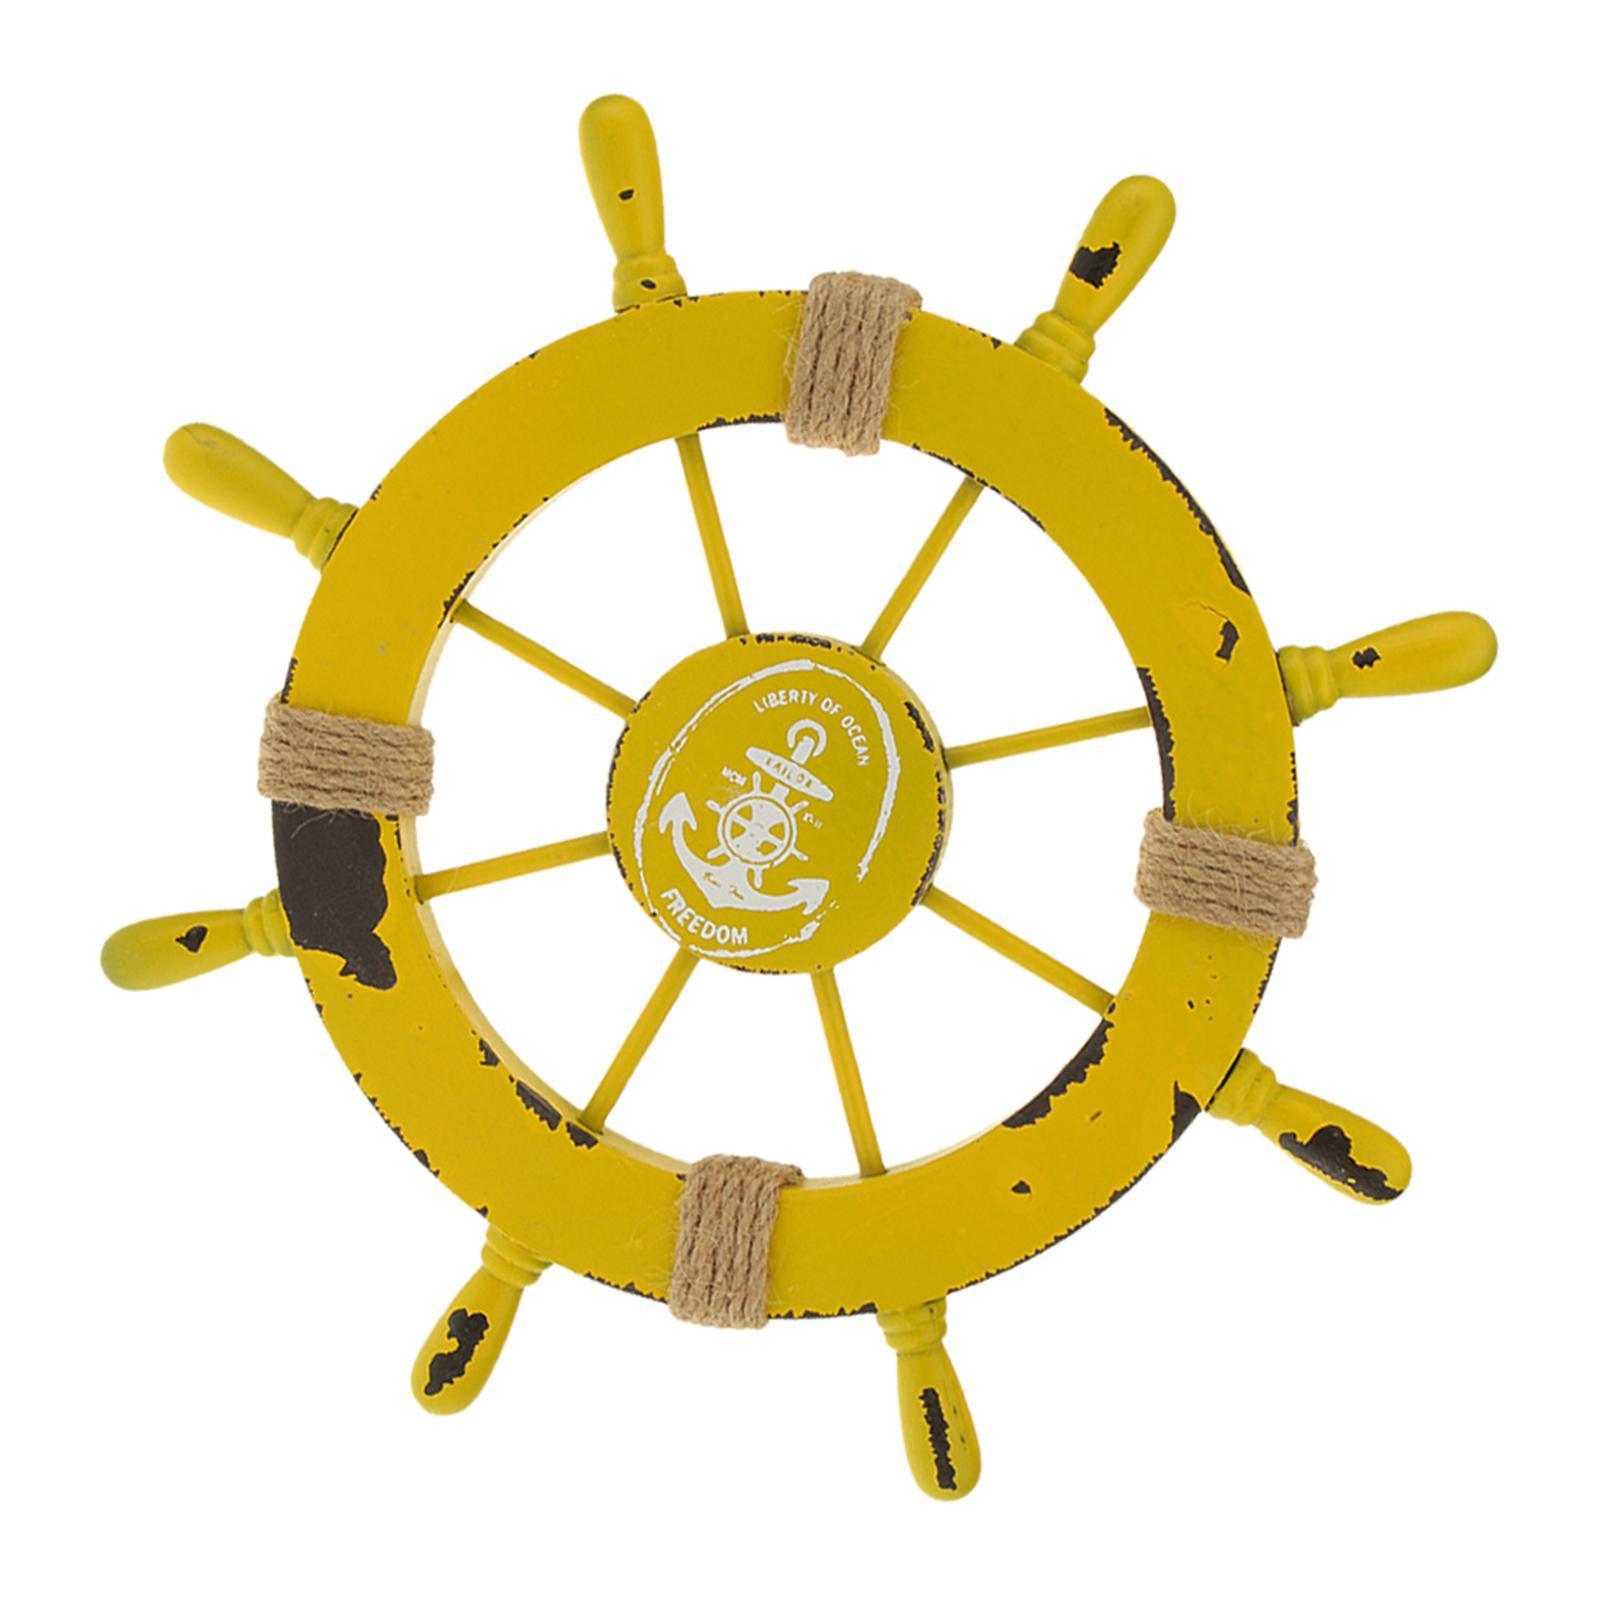 Nautical-Beach-Wooden-Boat-Ship-Wheel-Home-Bar-Wall-Party-Hanging-Decoration thumbnail 11